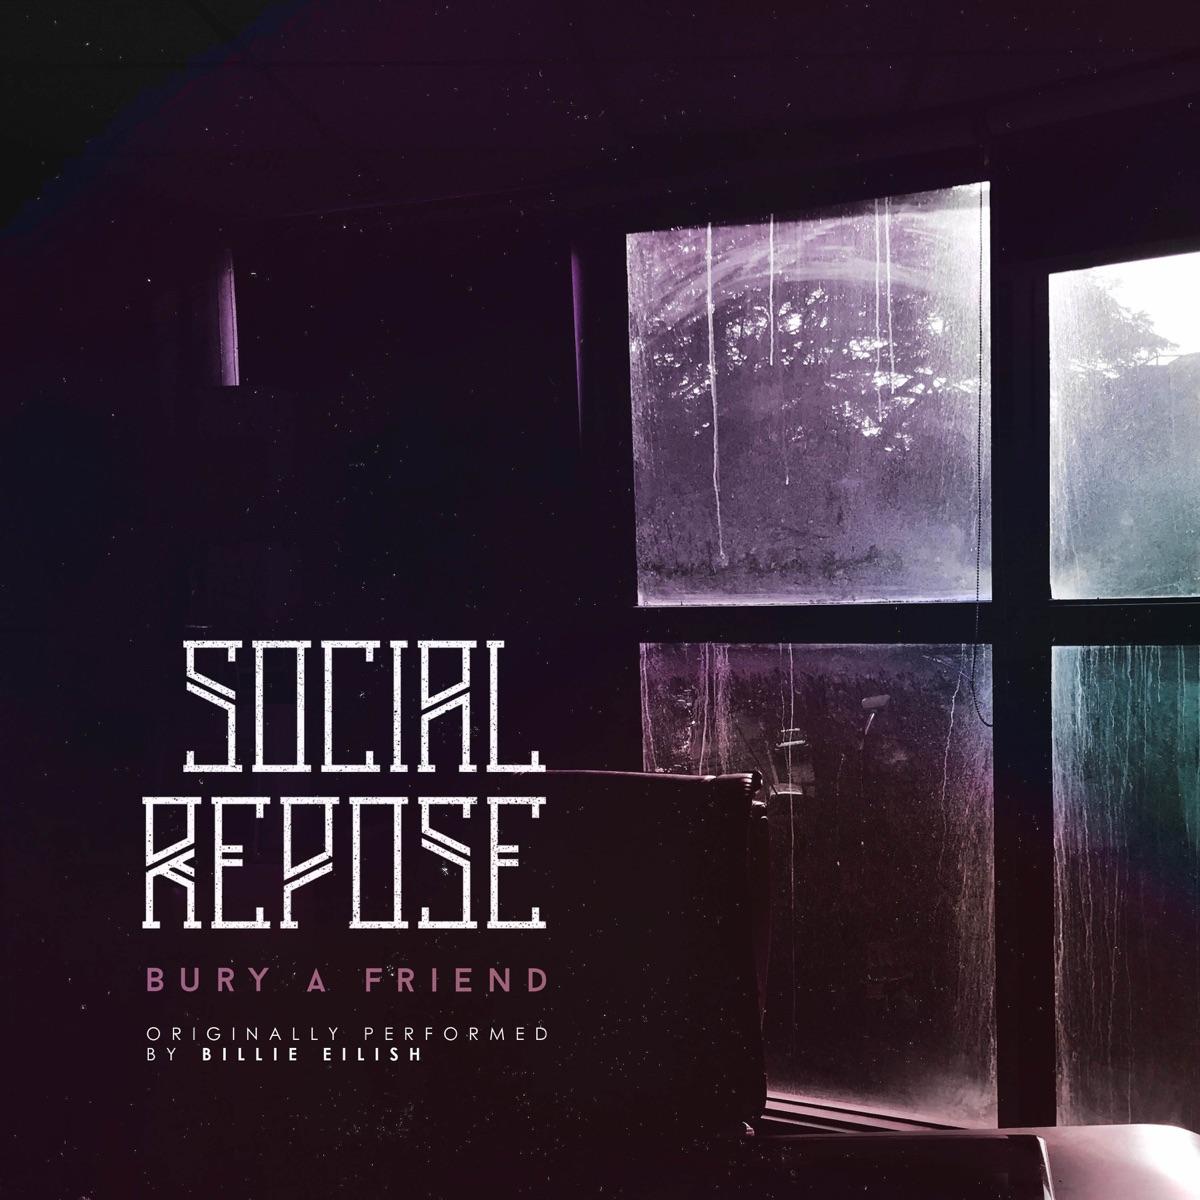 Bury a Friend - Single Social Repose CD cover